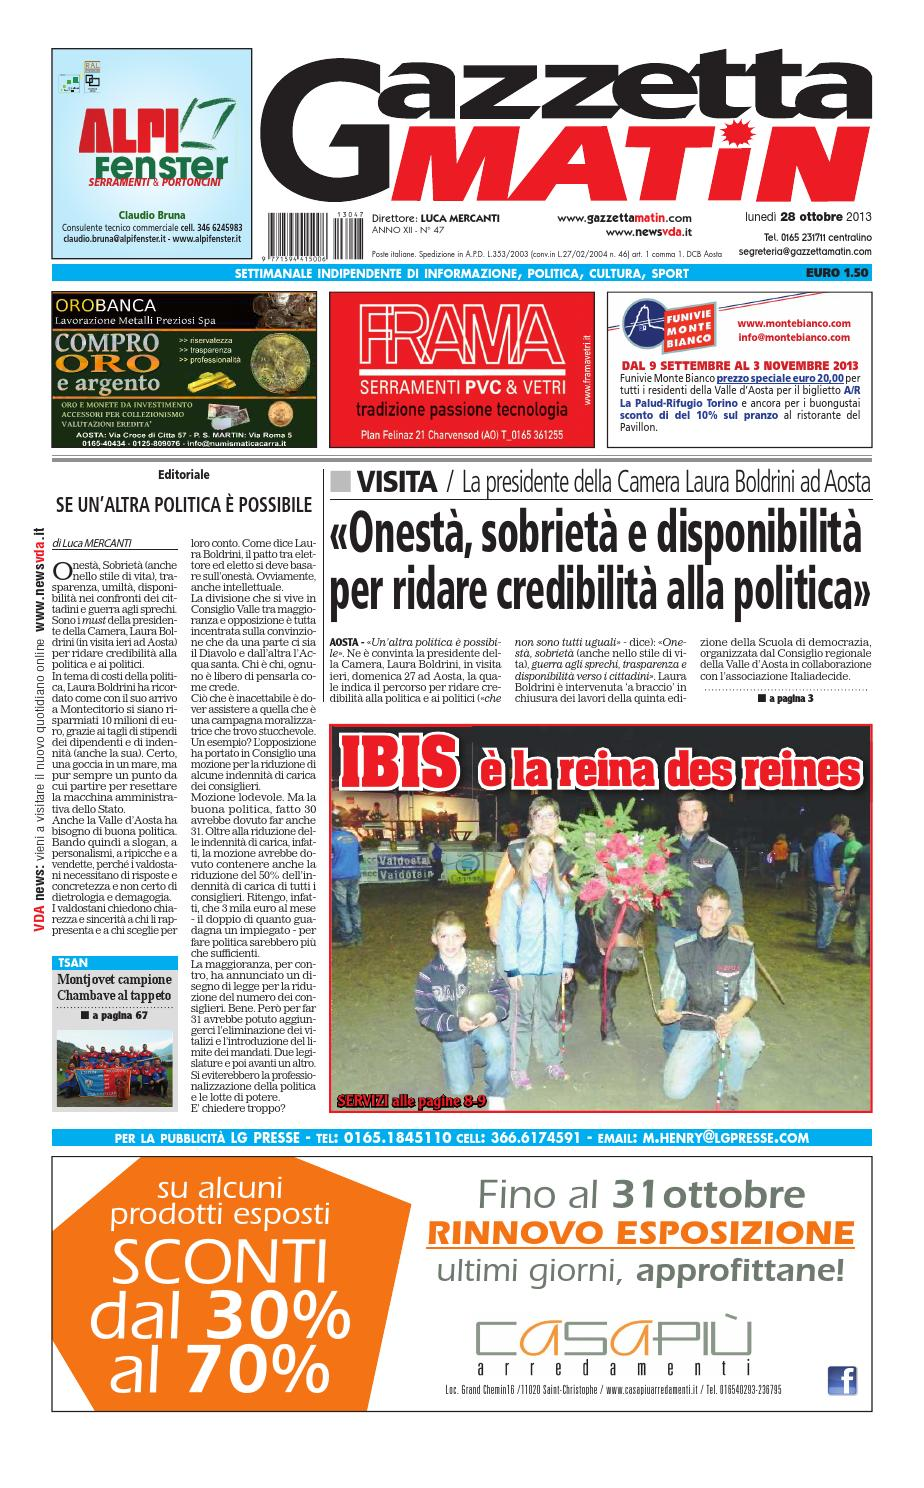 Gazzetta matin del 28 ottobre 2013 by luca mercanti issuu for Luca arredamenti torino